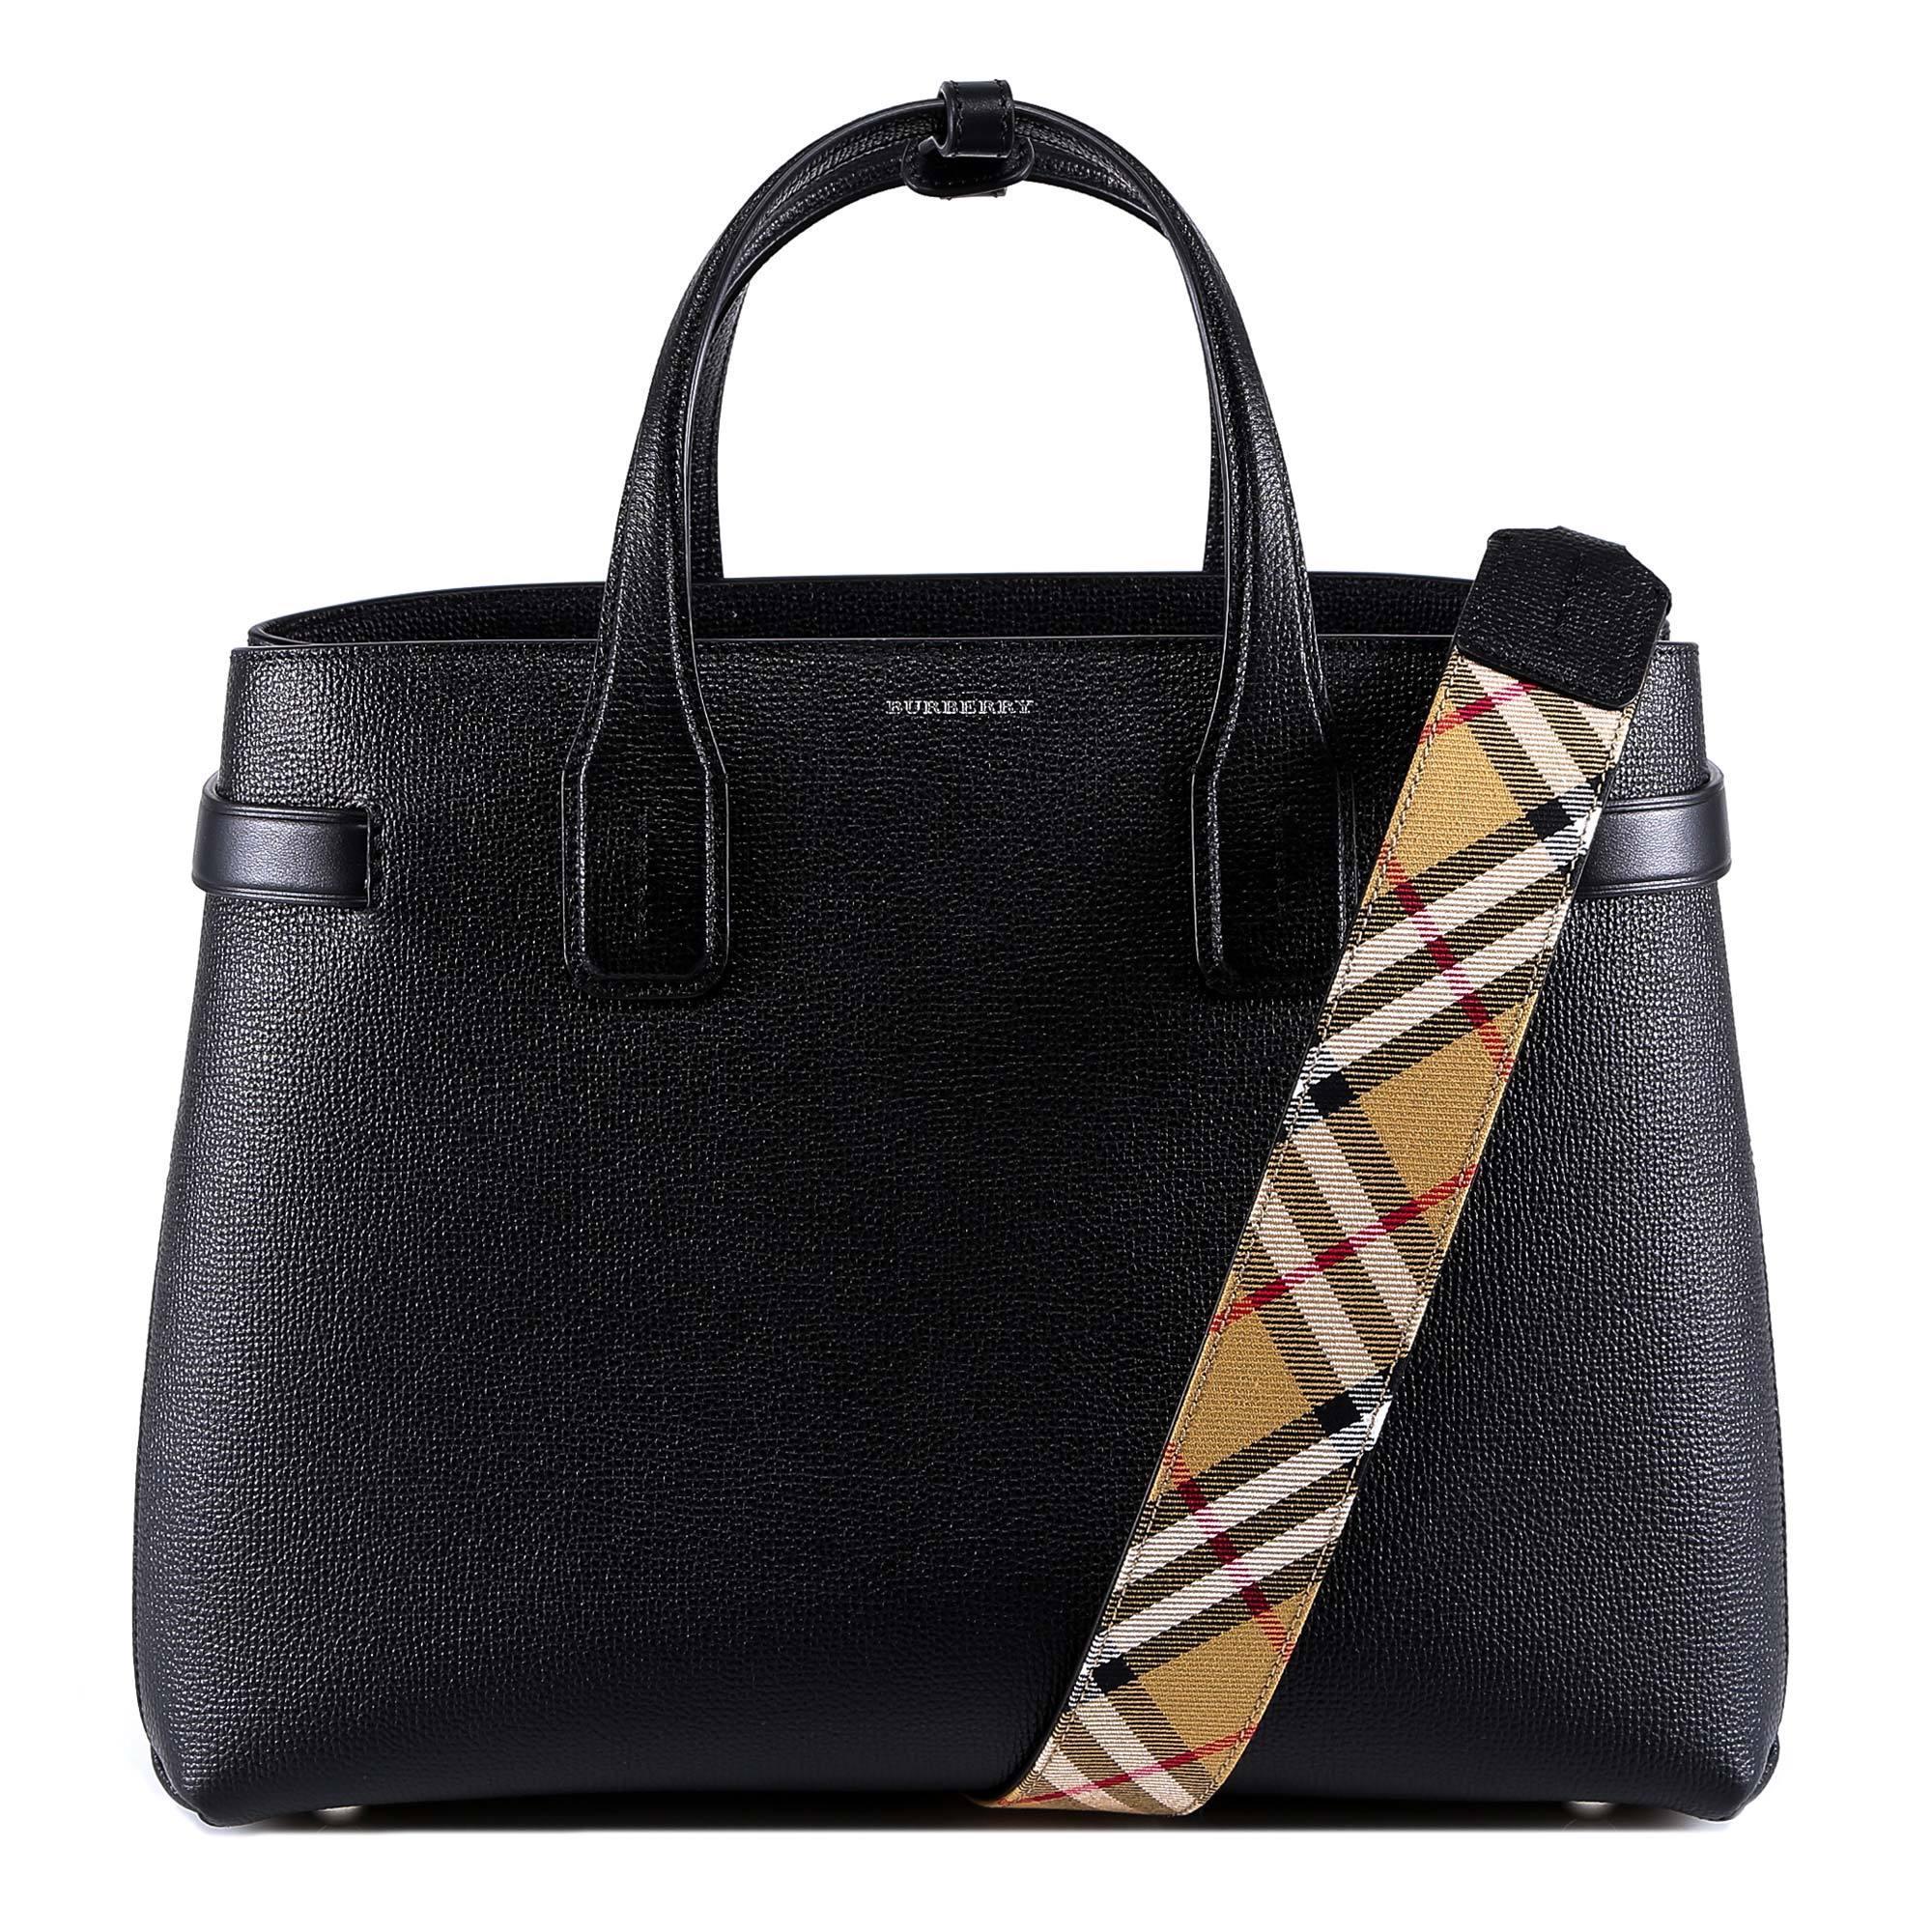 c88660f1f5 Burberry Medium Banner Top Handle Bag in Black - Lyst